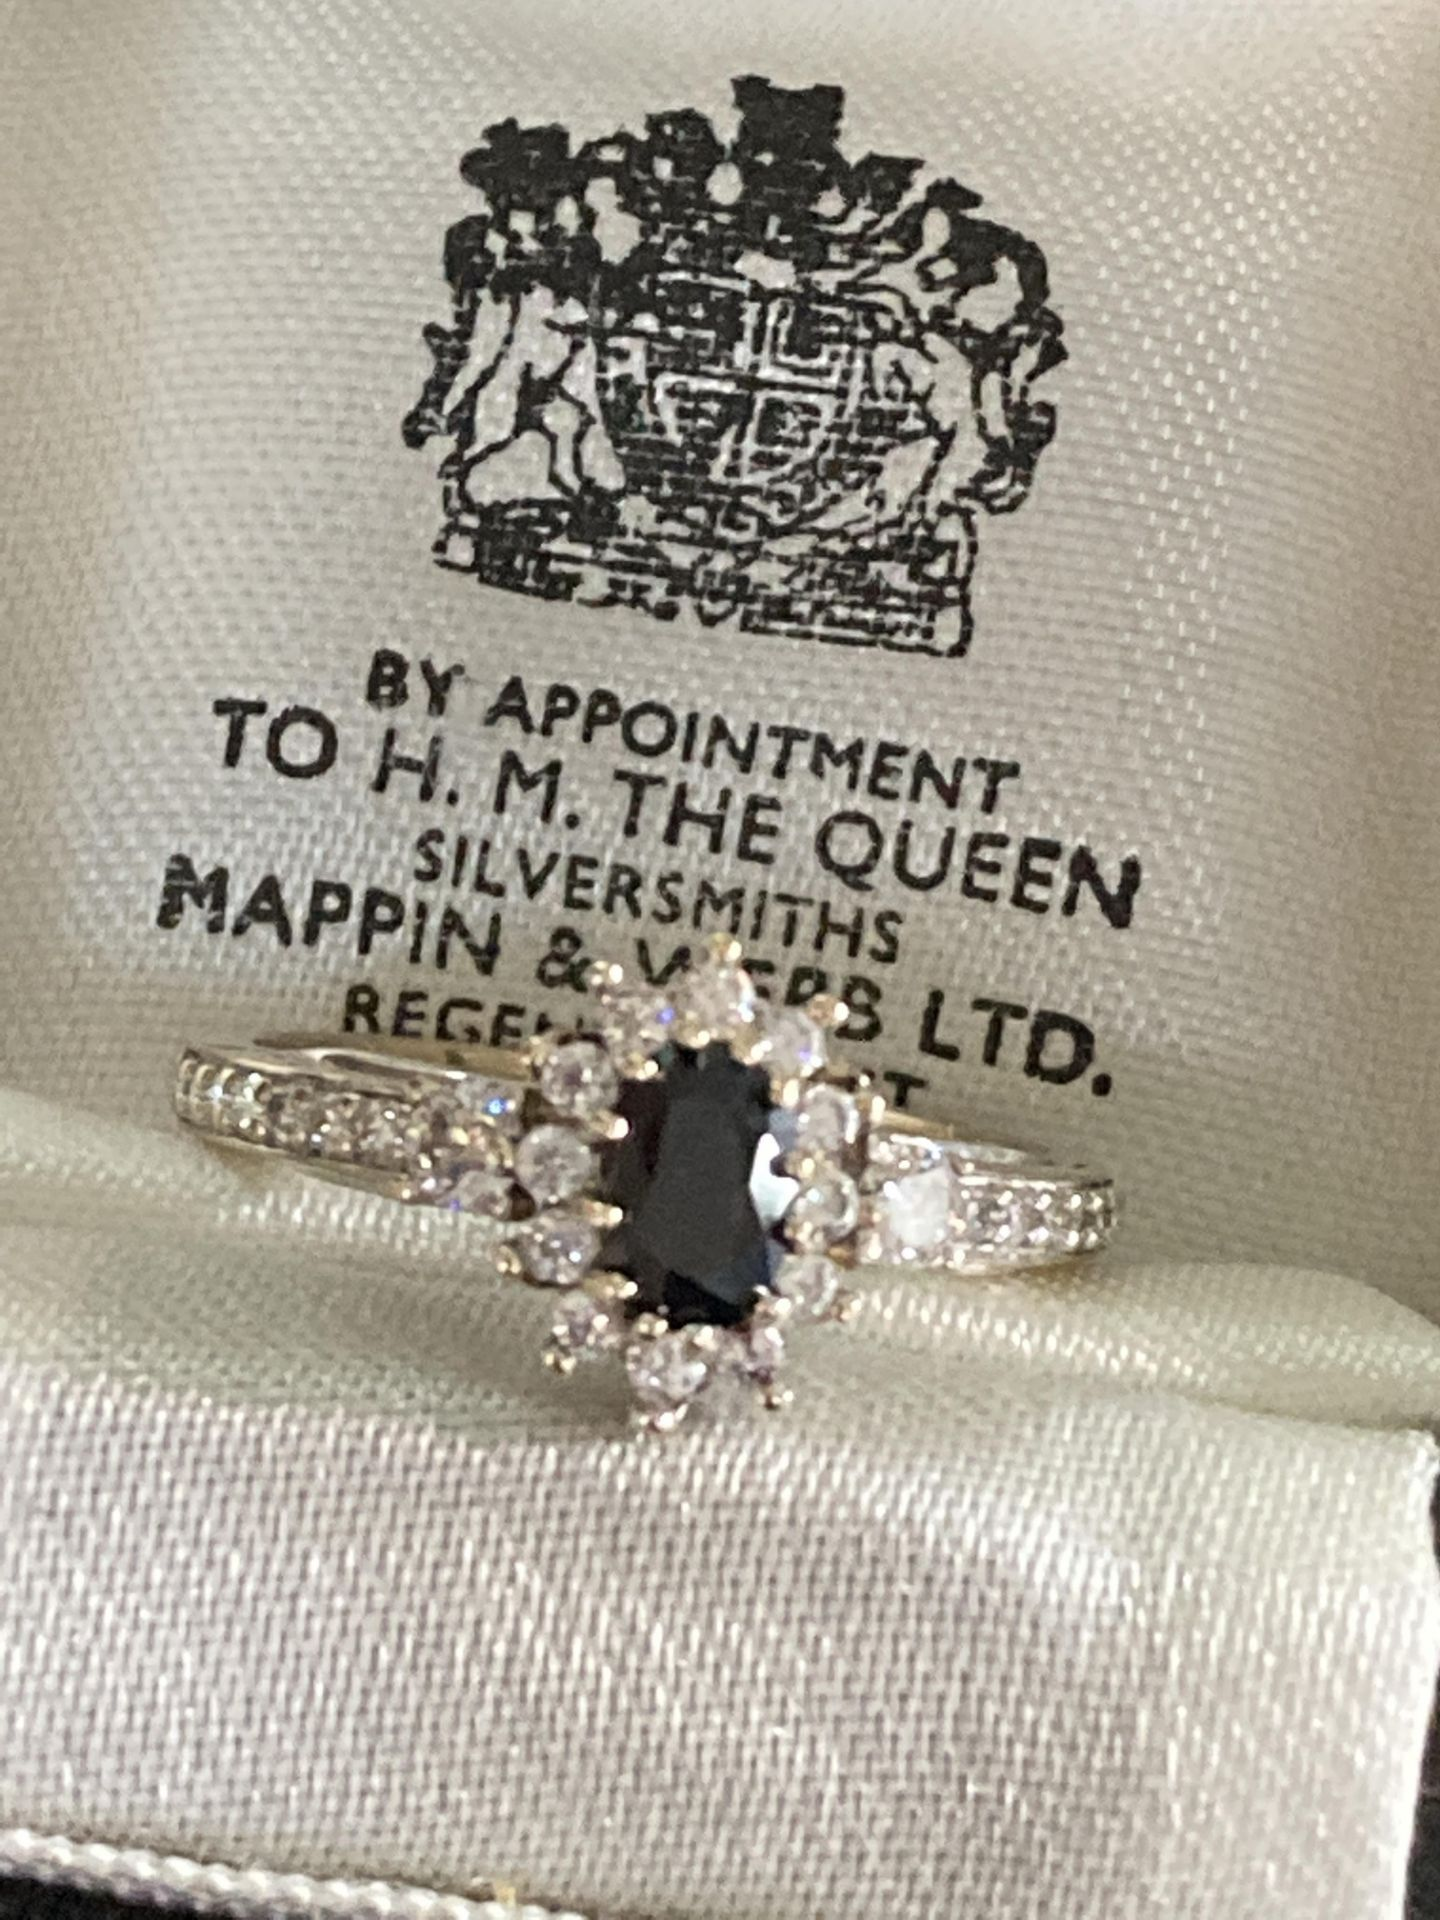 18K GOLD DIAMOND & SAPPHIRE RING - SIZE N /12 - Image 4 of 6